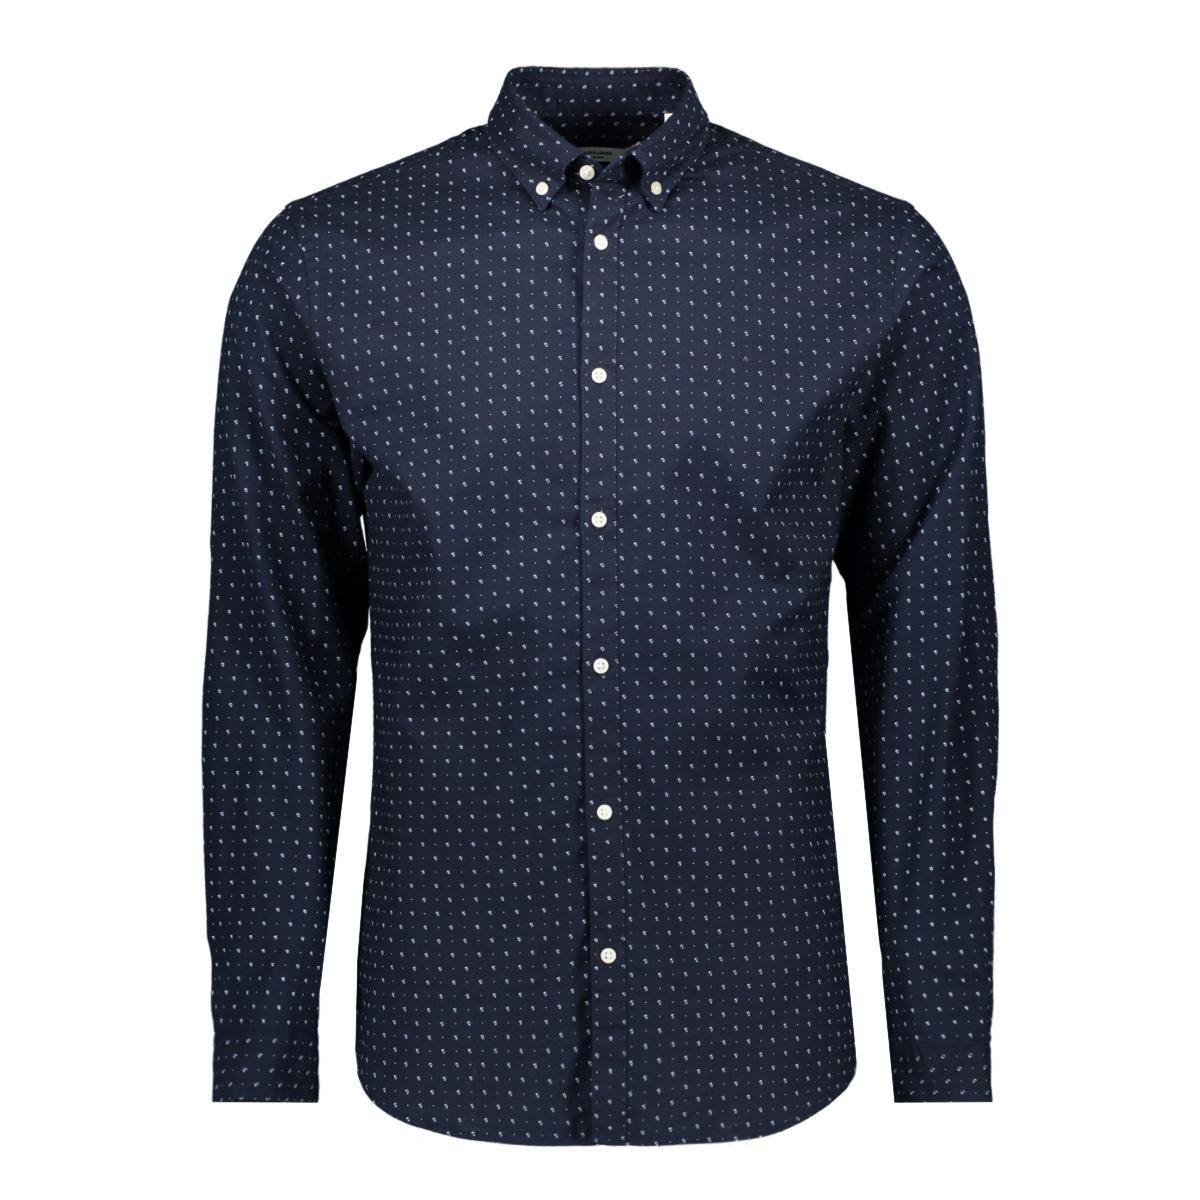 jprblalogo stretch aop shirt l/s 12169911 jack & jones overhemd navy blazer/slim fit